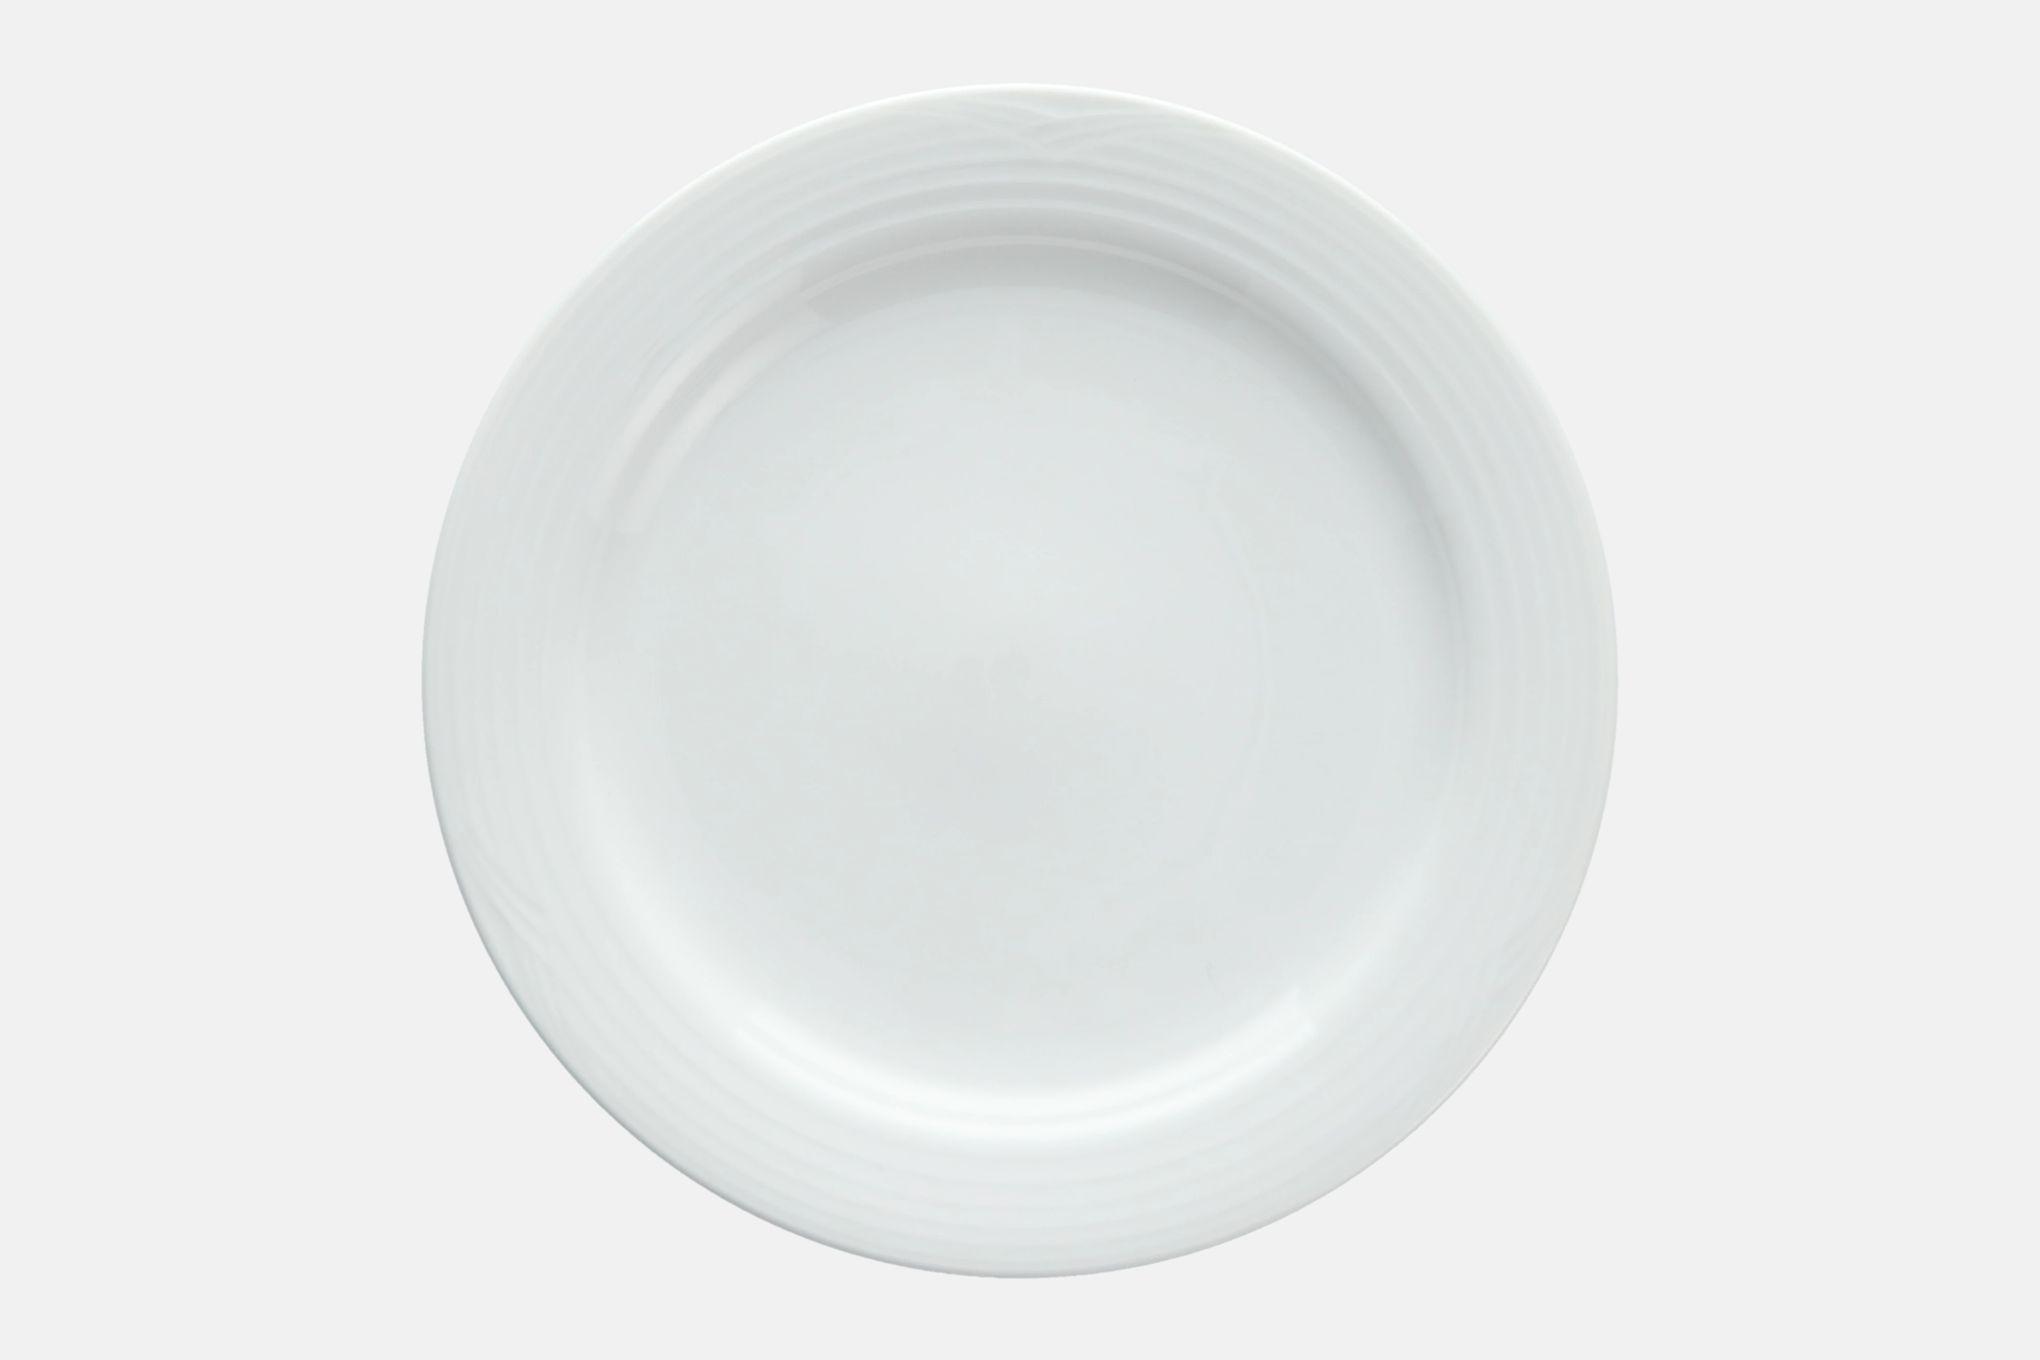 Noritake Arctic White Starter / Salad / Dessert Plate 21.3cm thumb 1